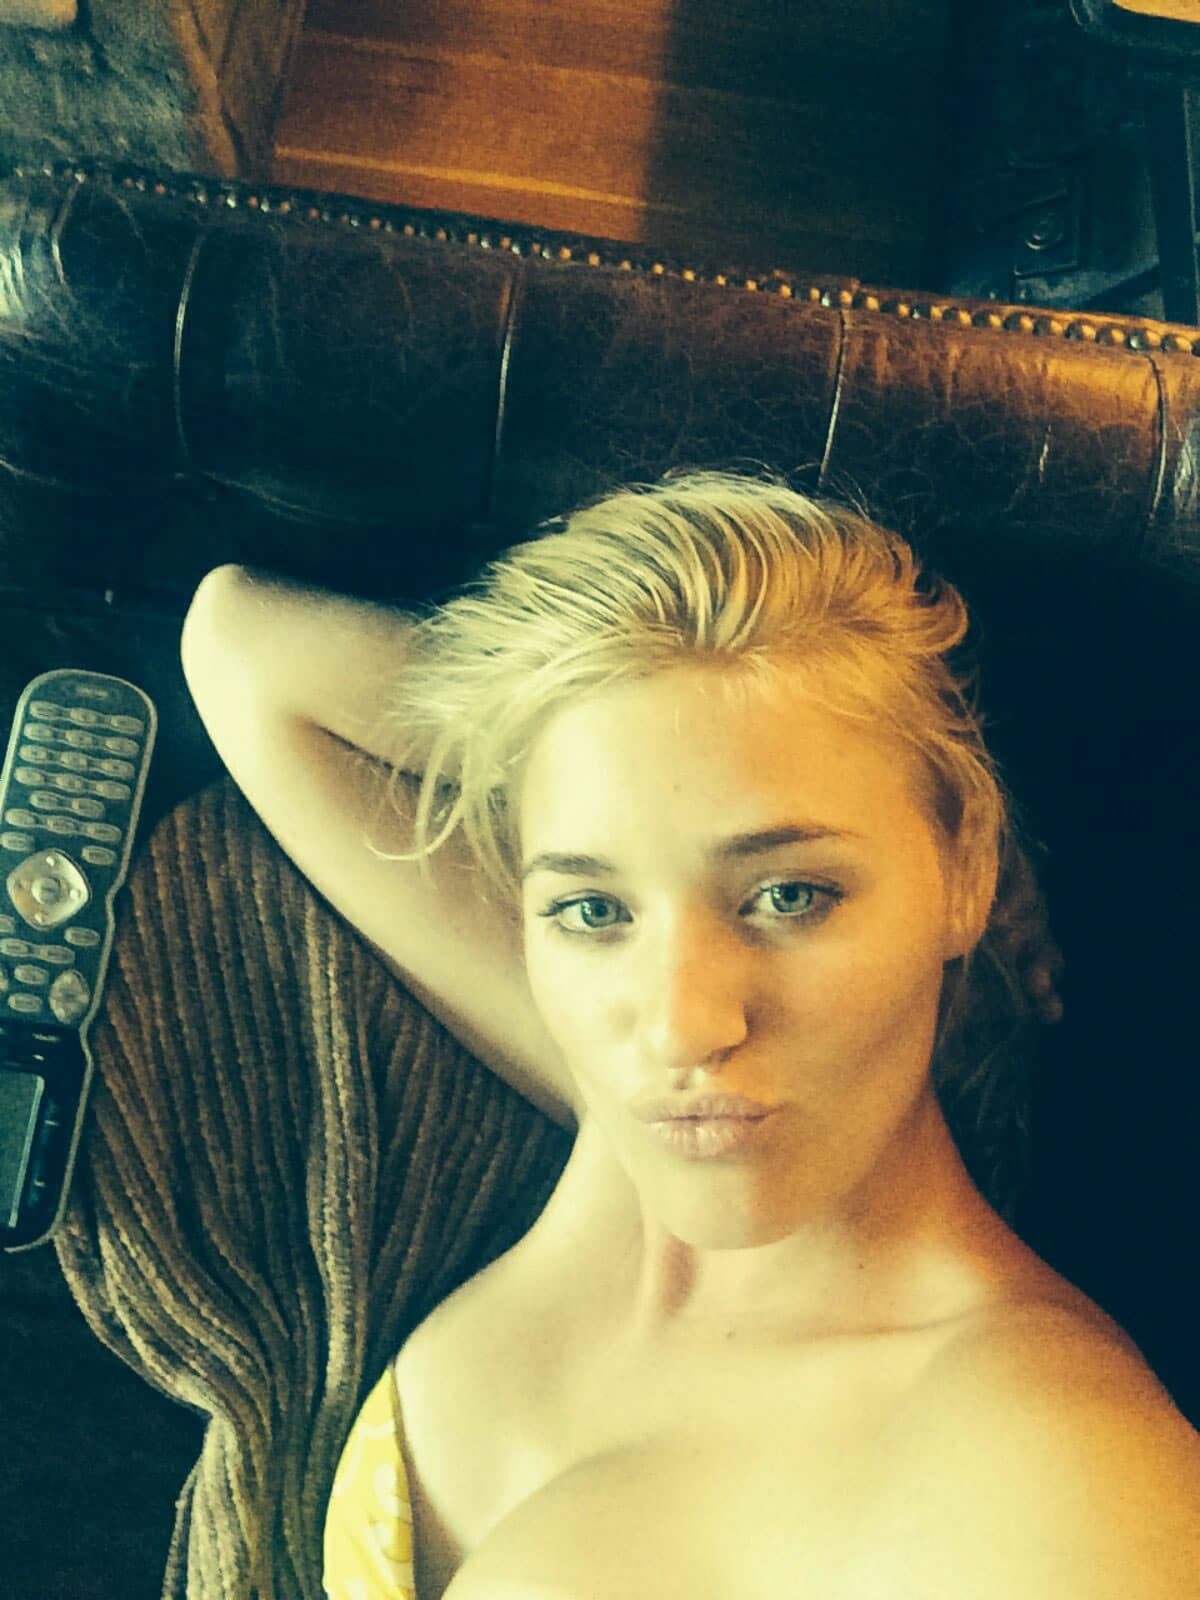 AJ Michalka taking a selfie resting her head on her arm